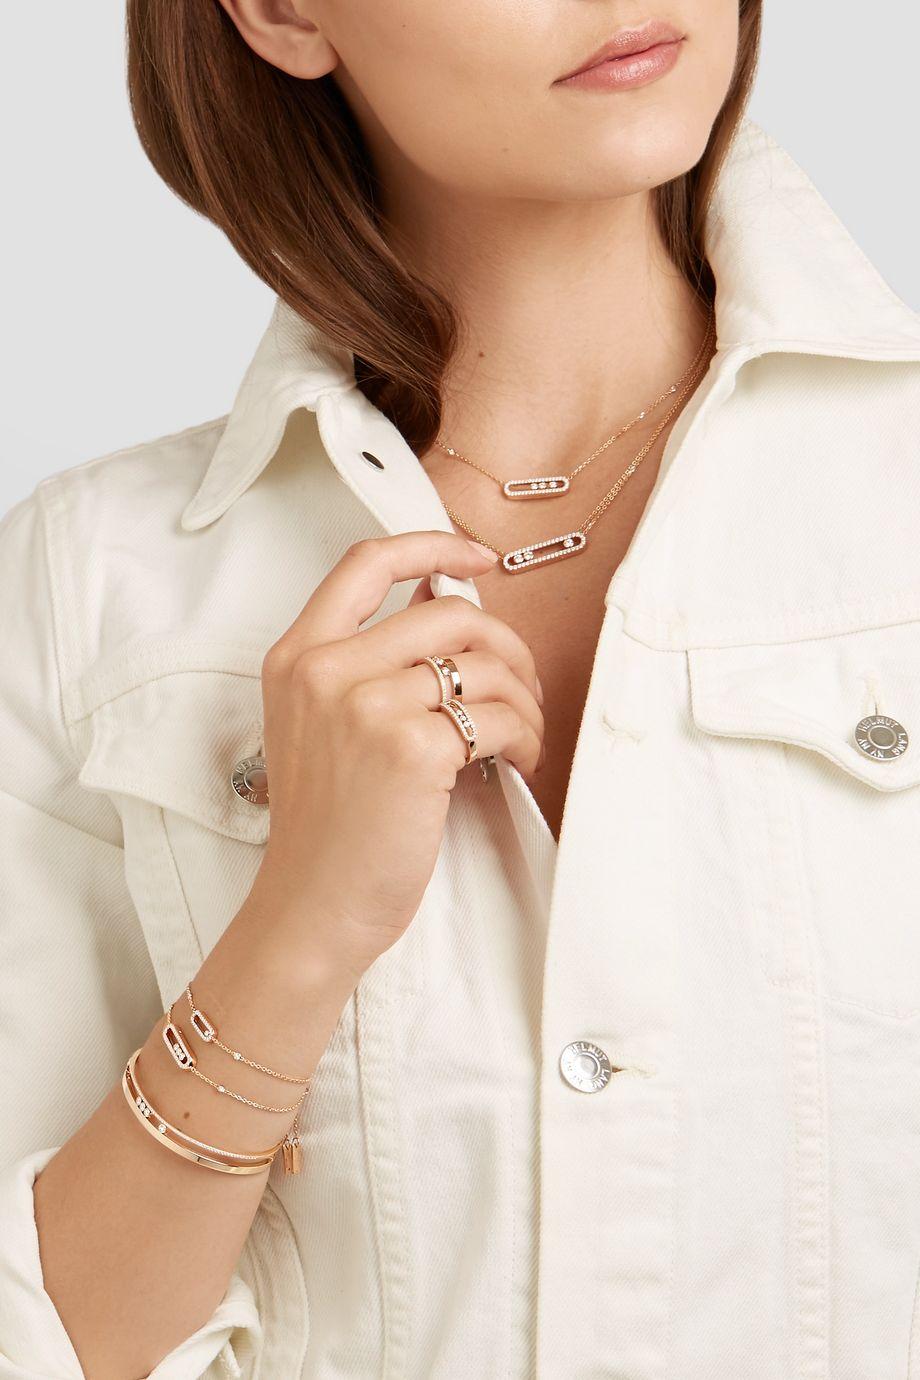 Messika Baby Move 18-karat rose gold diamond bracelet